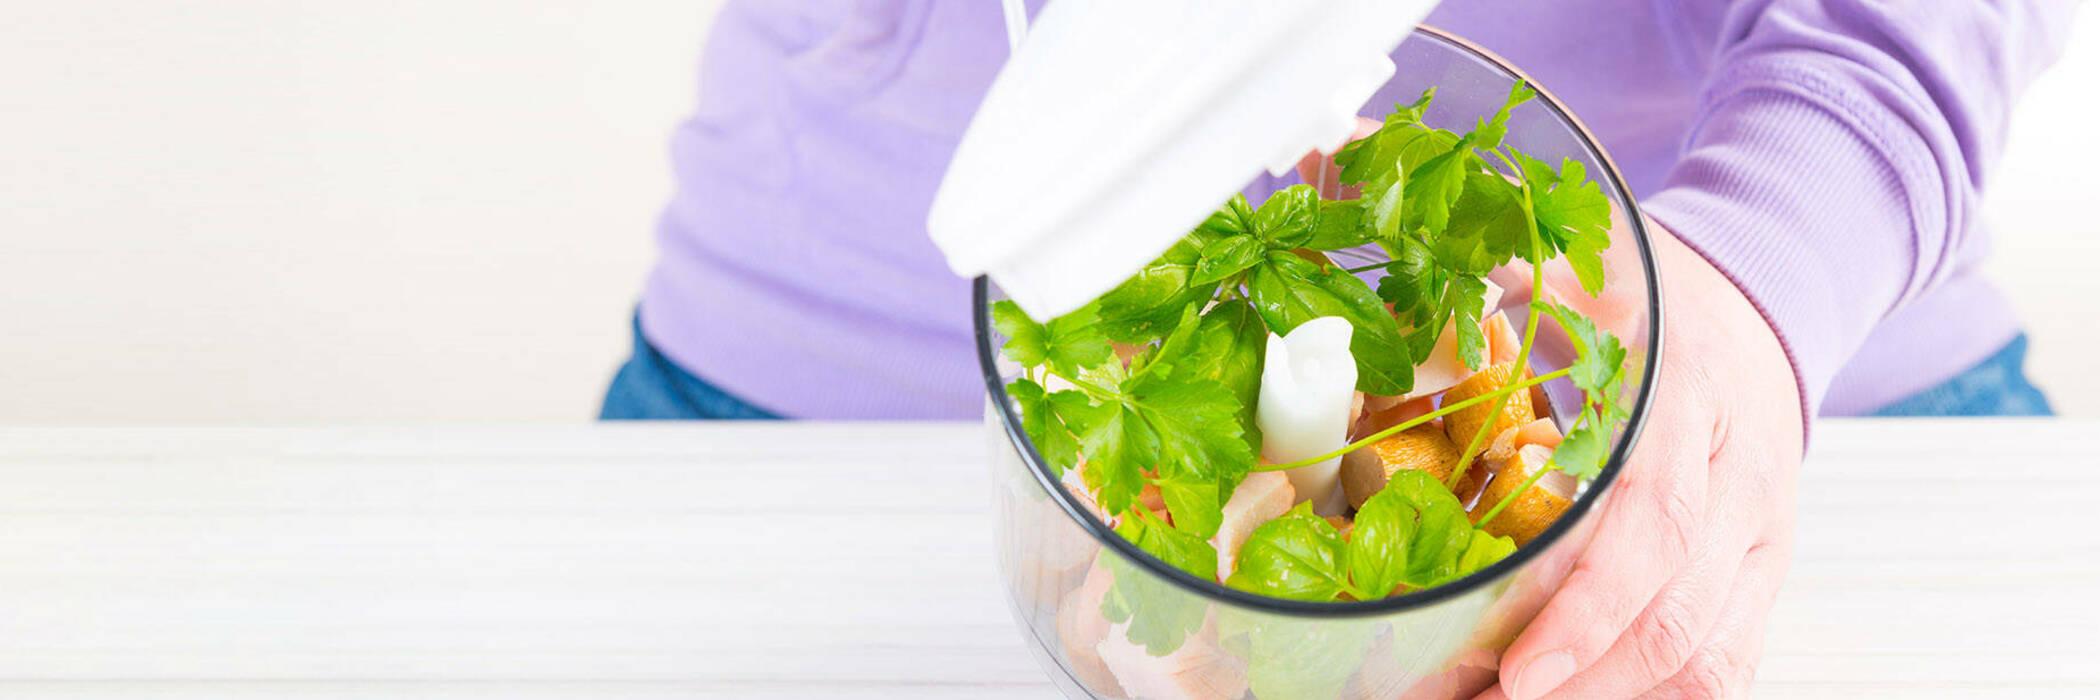 Fresh herbs in food processor